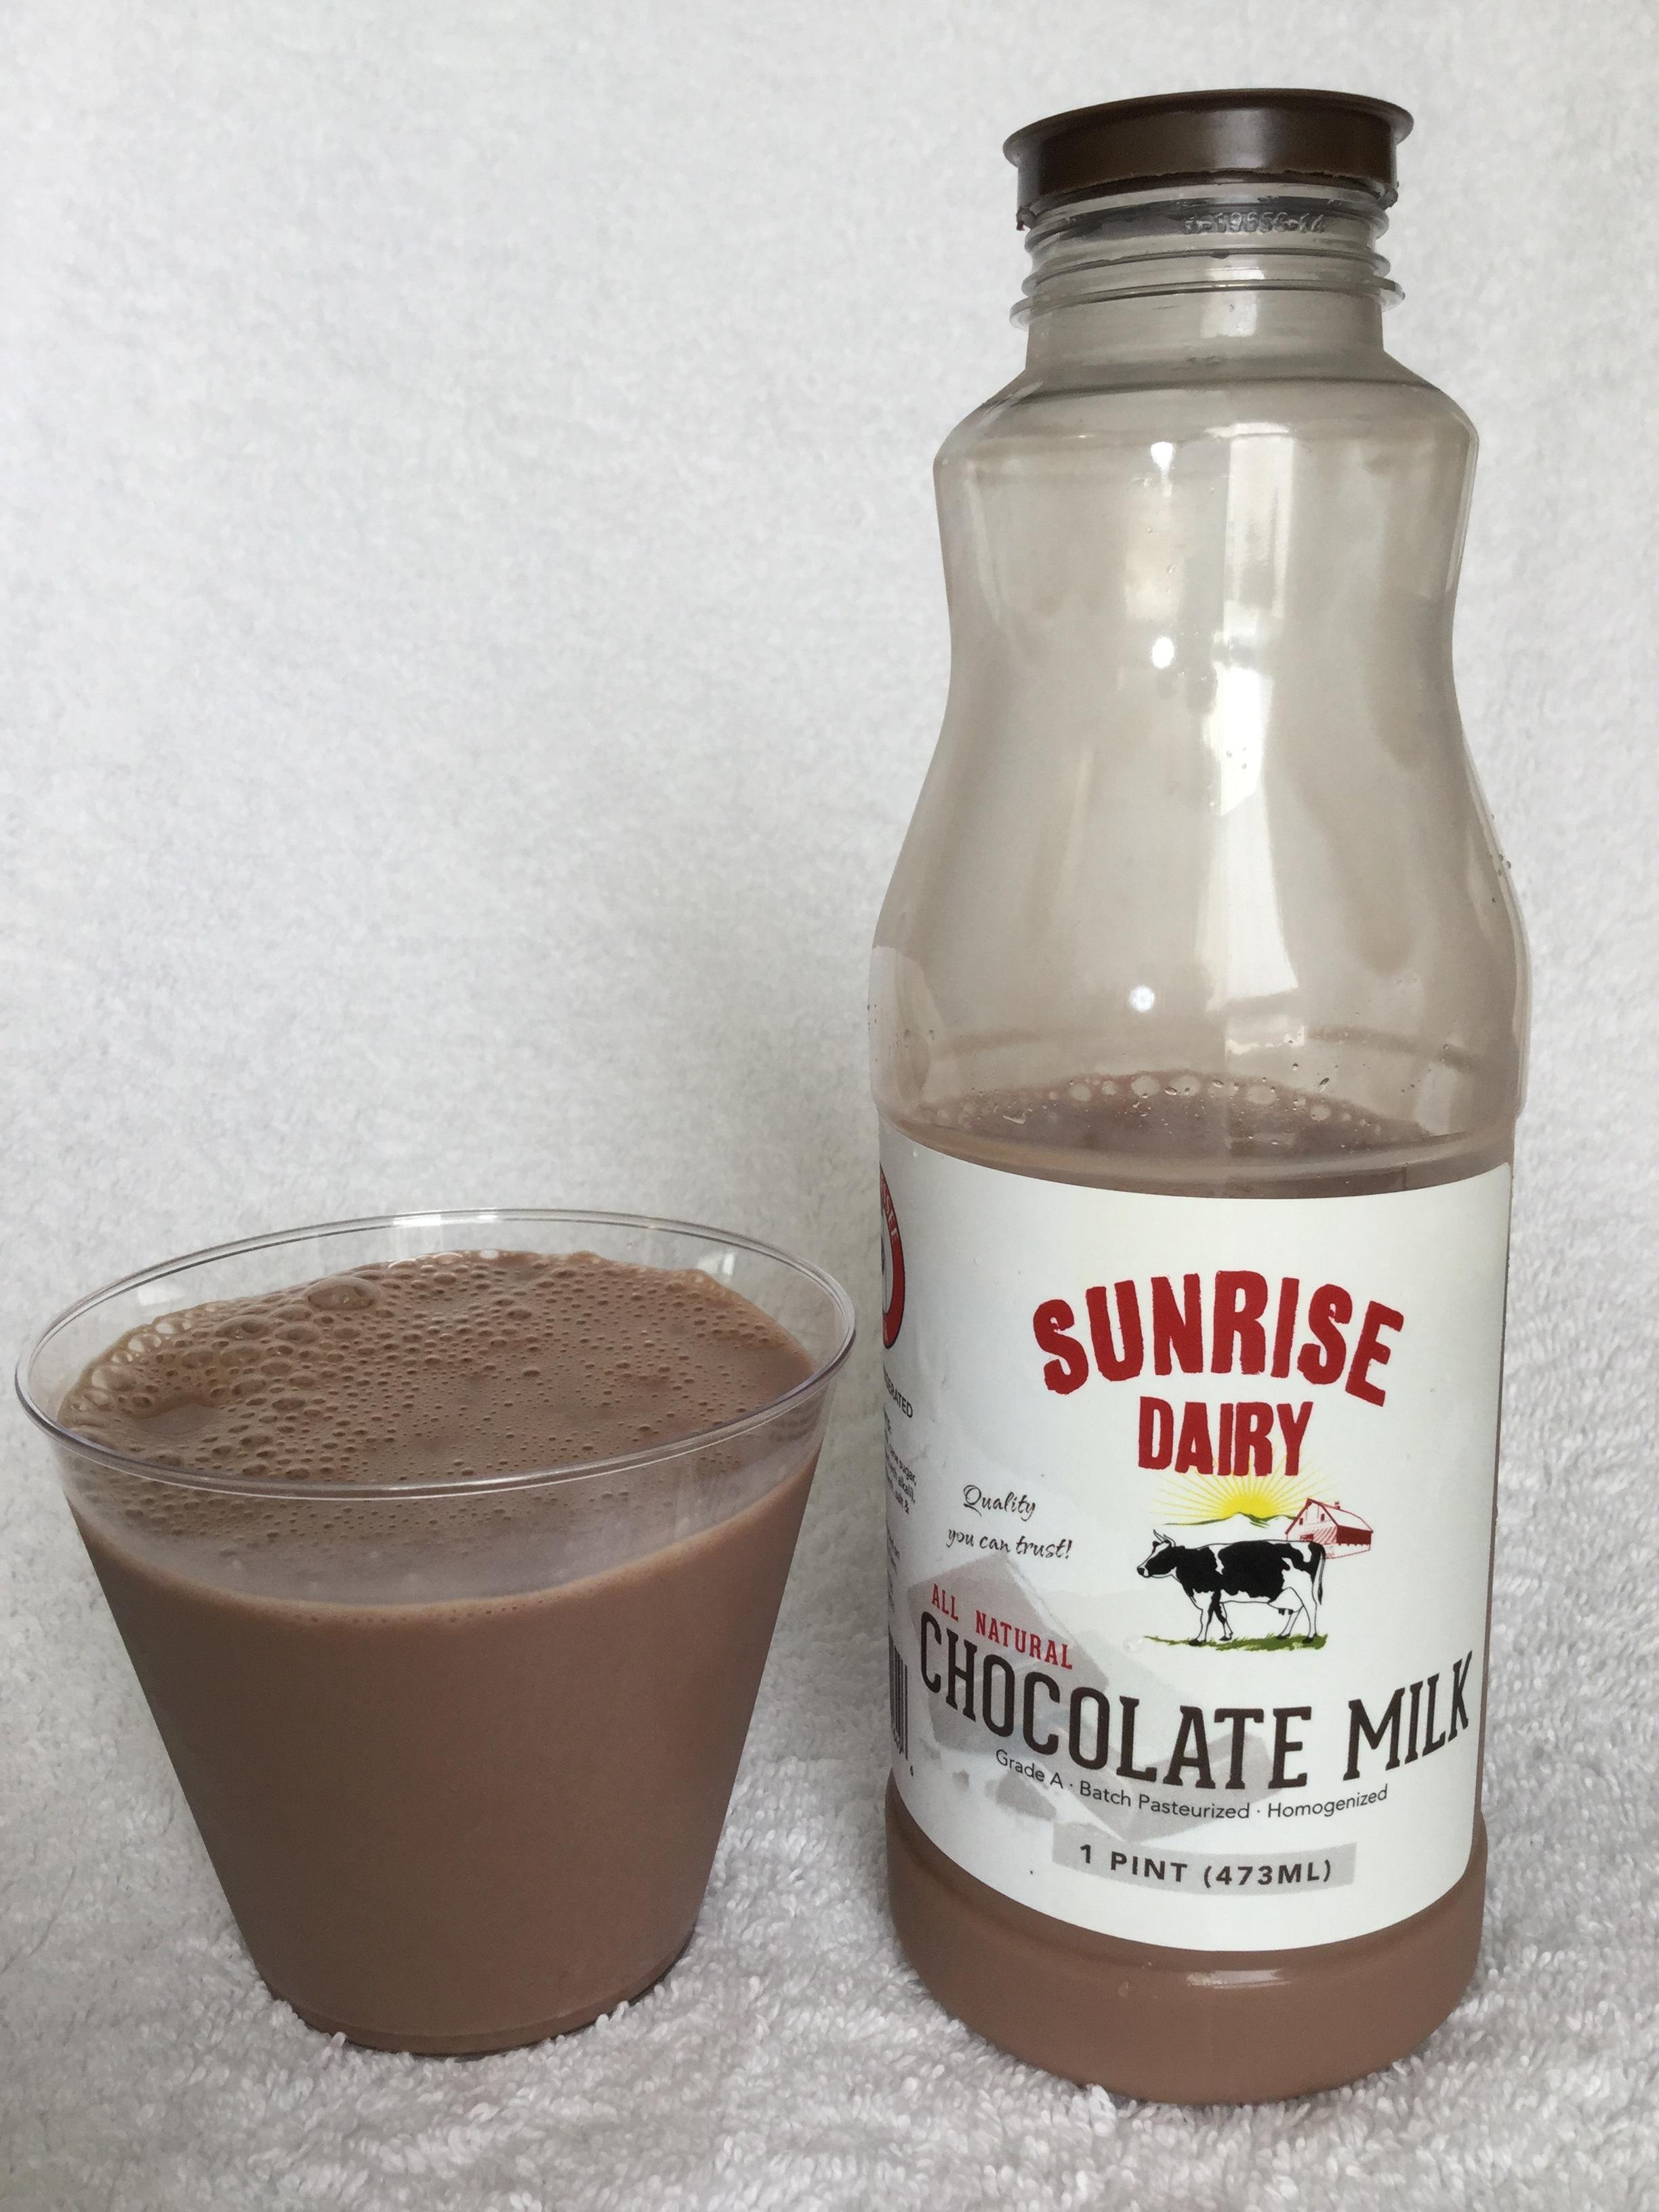 Sunrise Dairy Chocolate Milk Cup